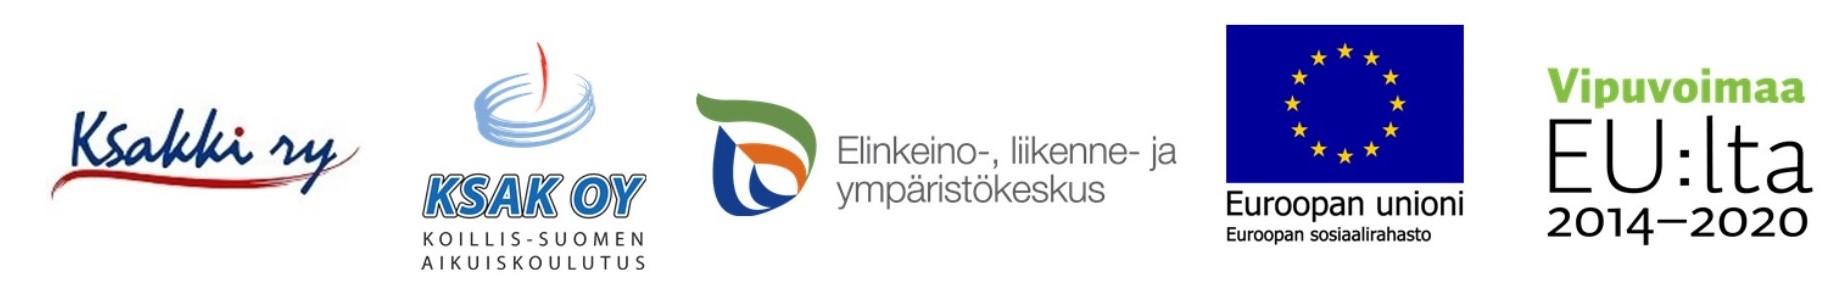 etsemppi-hankkeen osallistujien logot